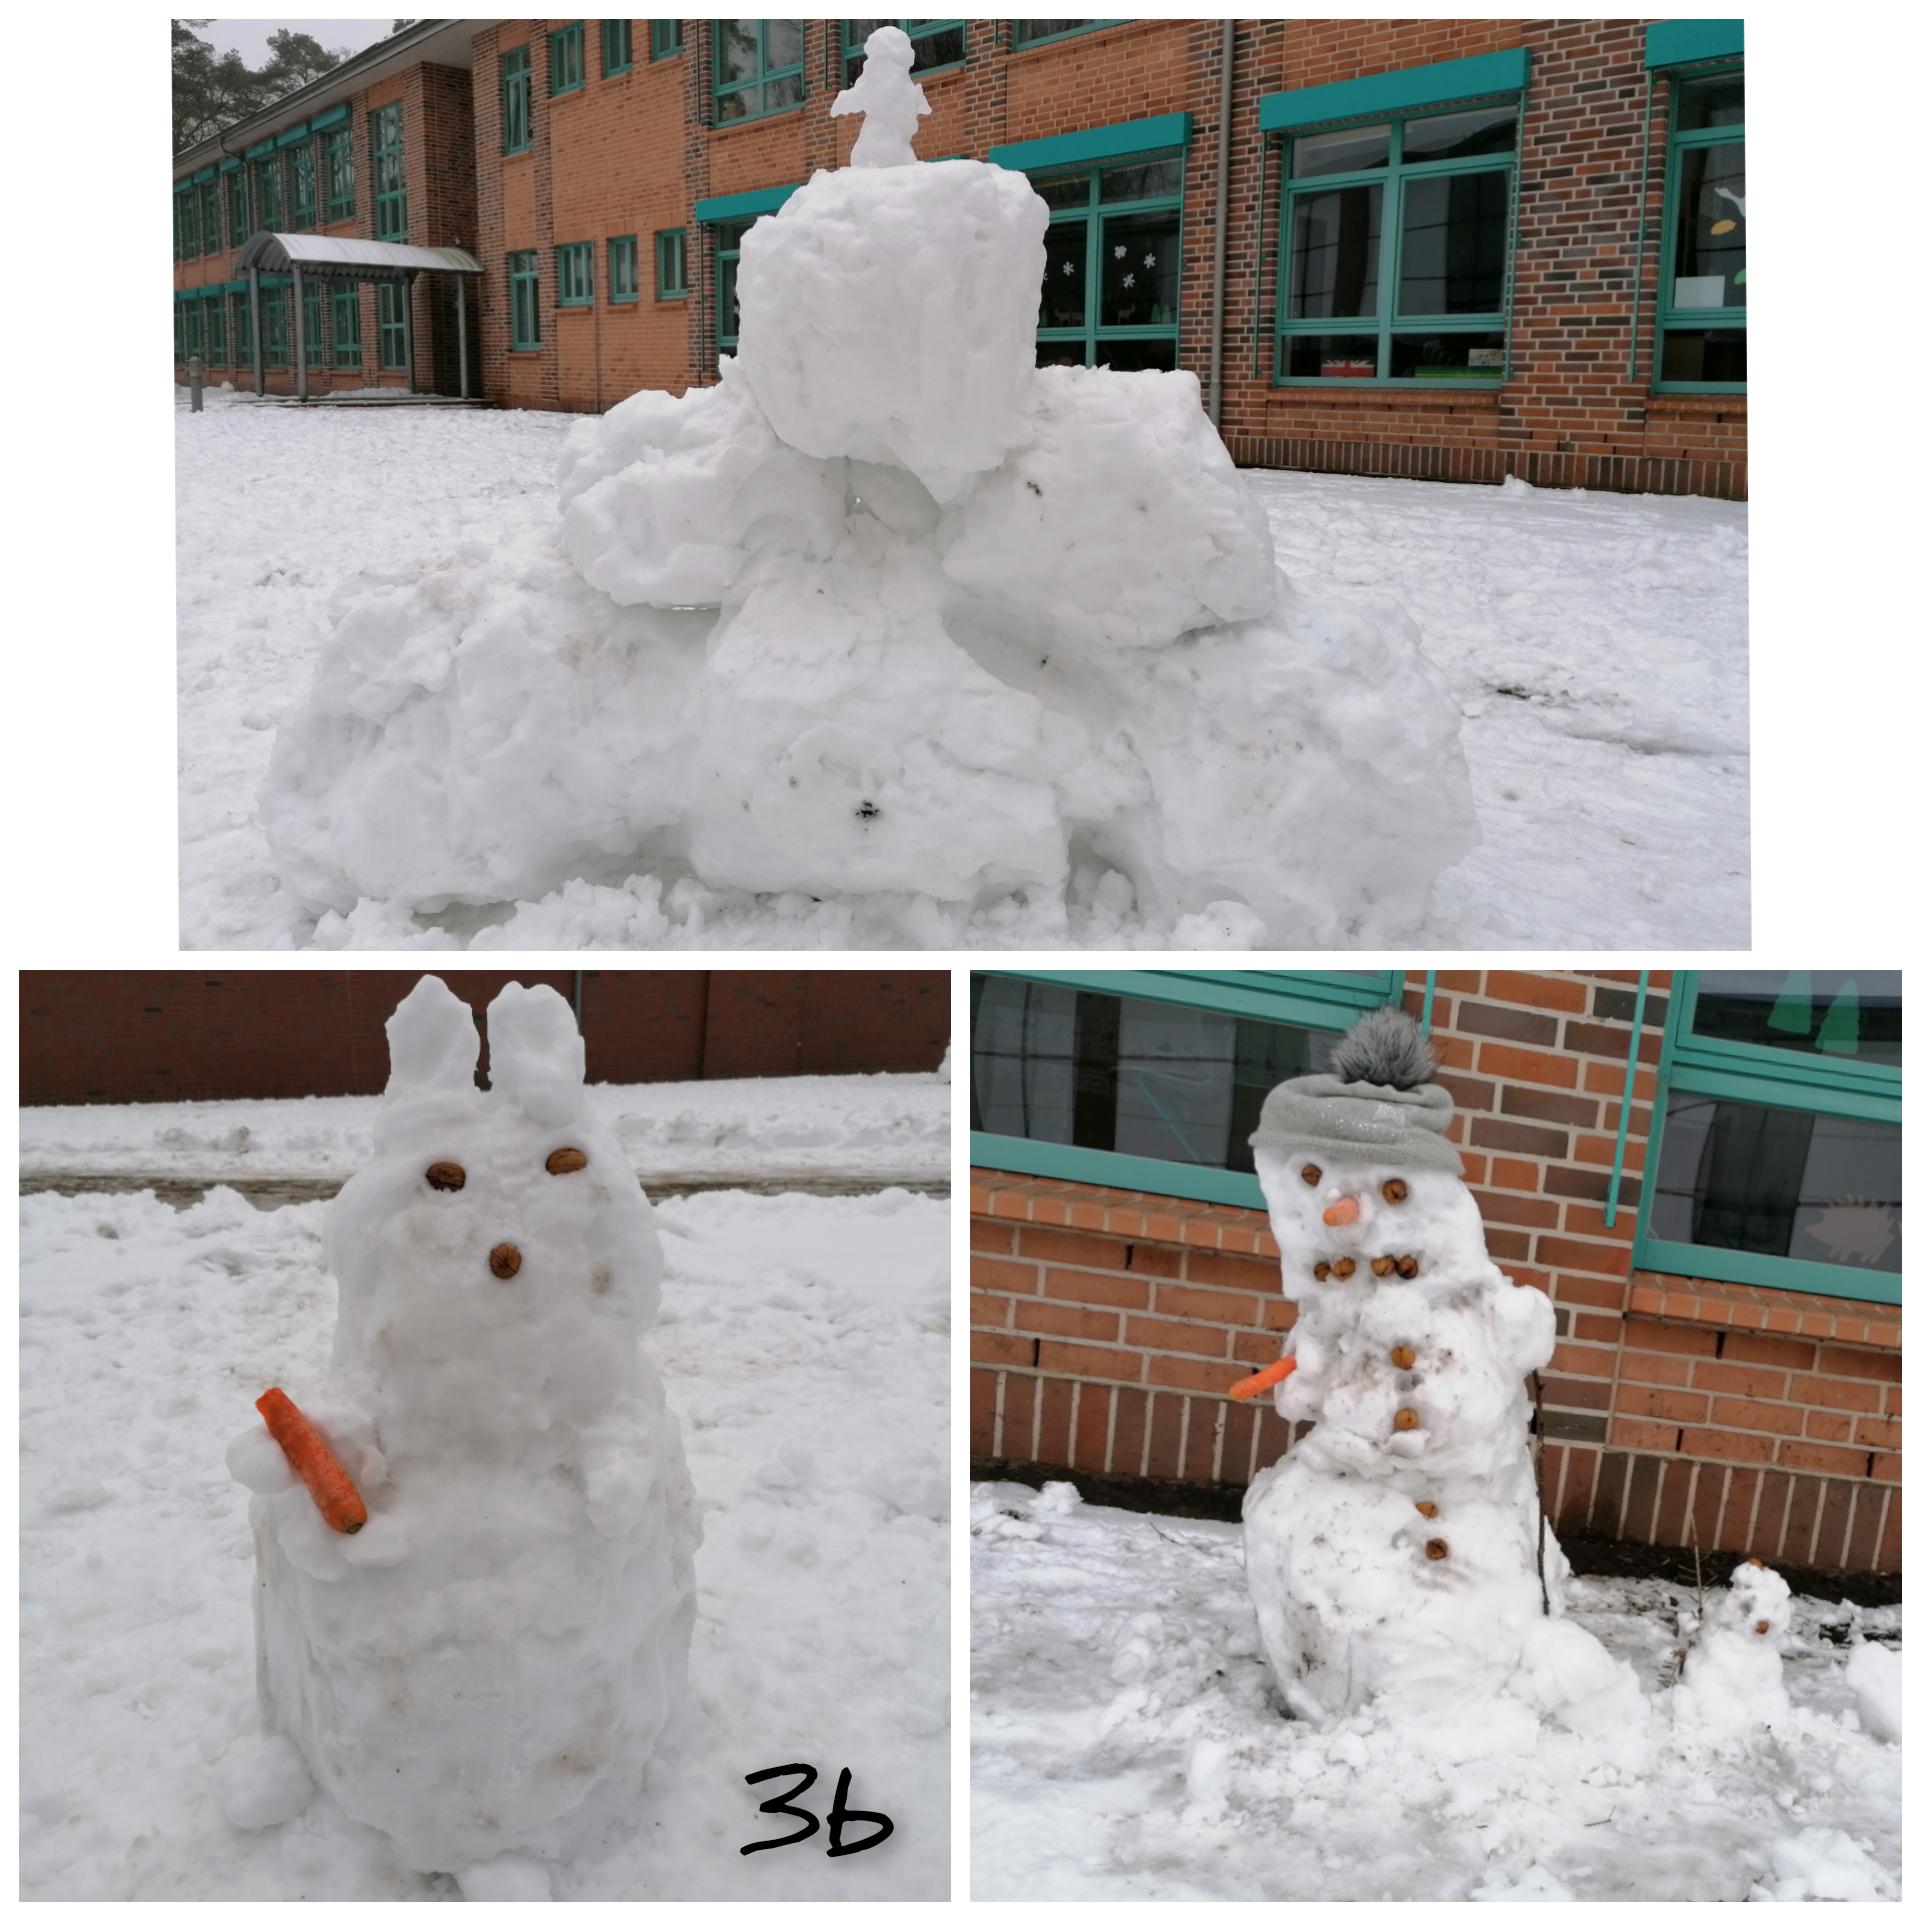 Schneefiguren_3b alle